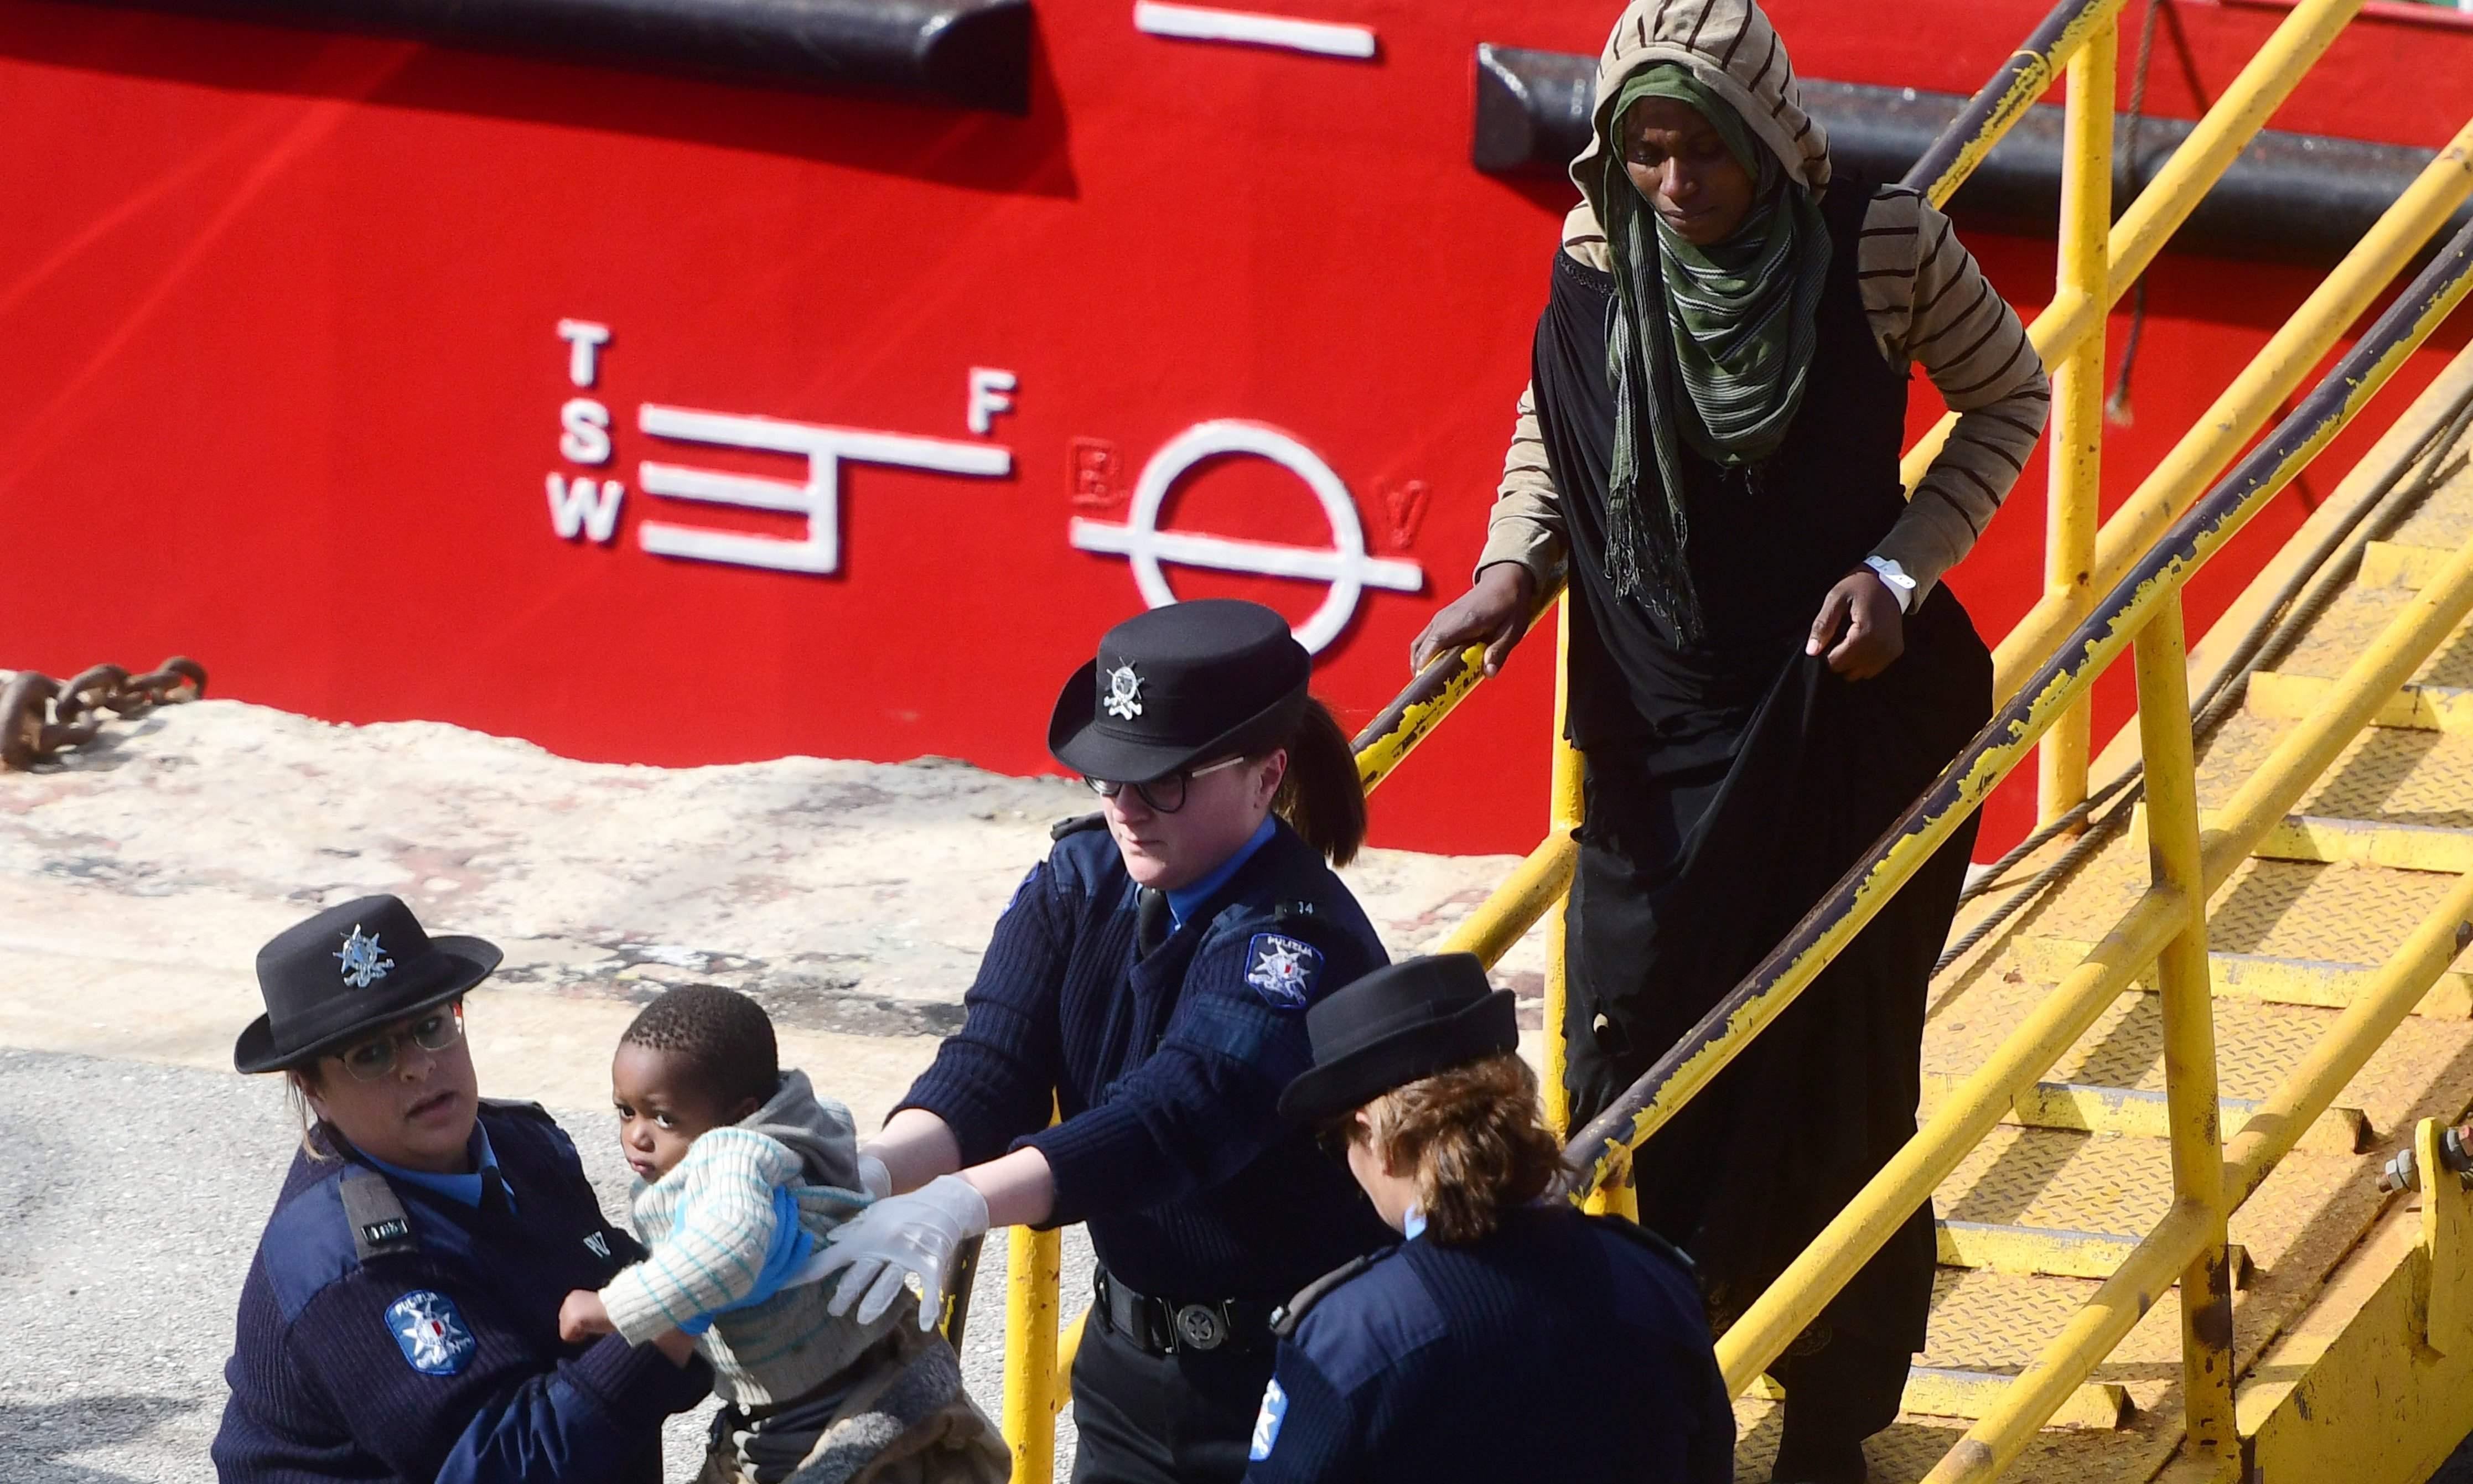 Hijacked captain recalls 'horror' in Mediterranean Sea as migrants took over ship